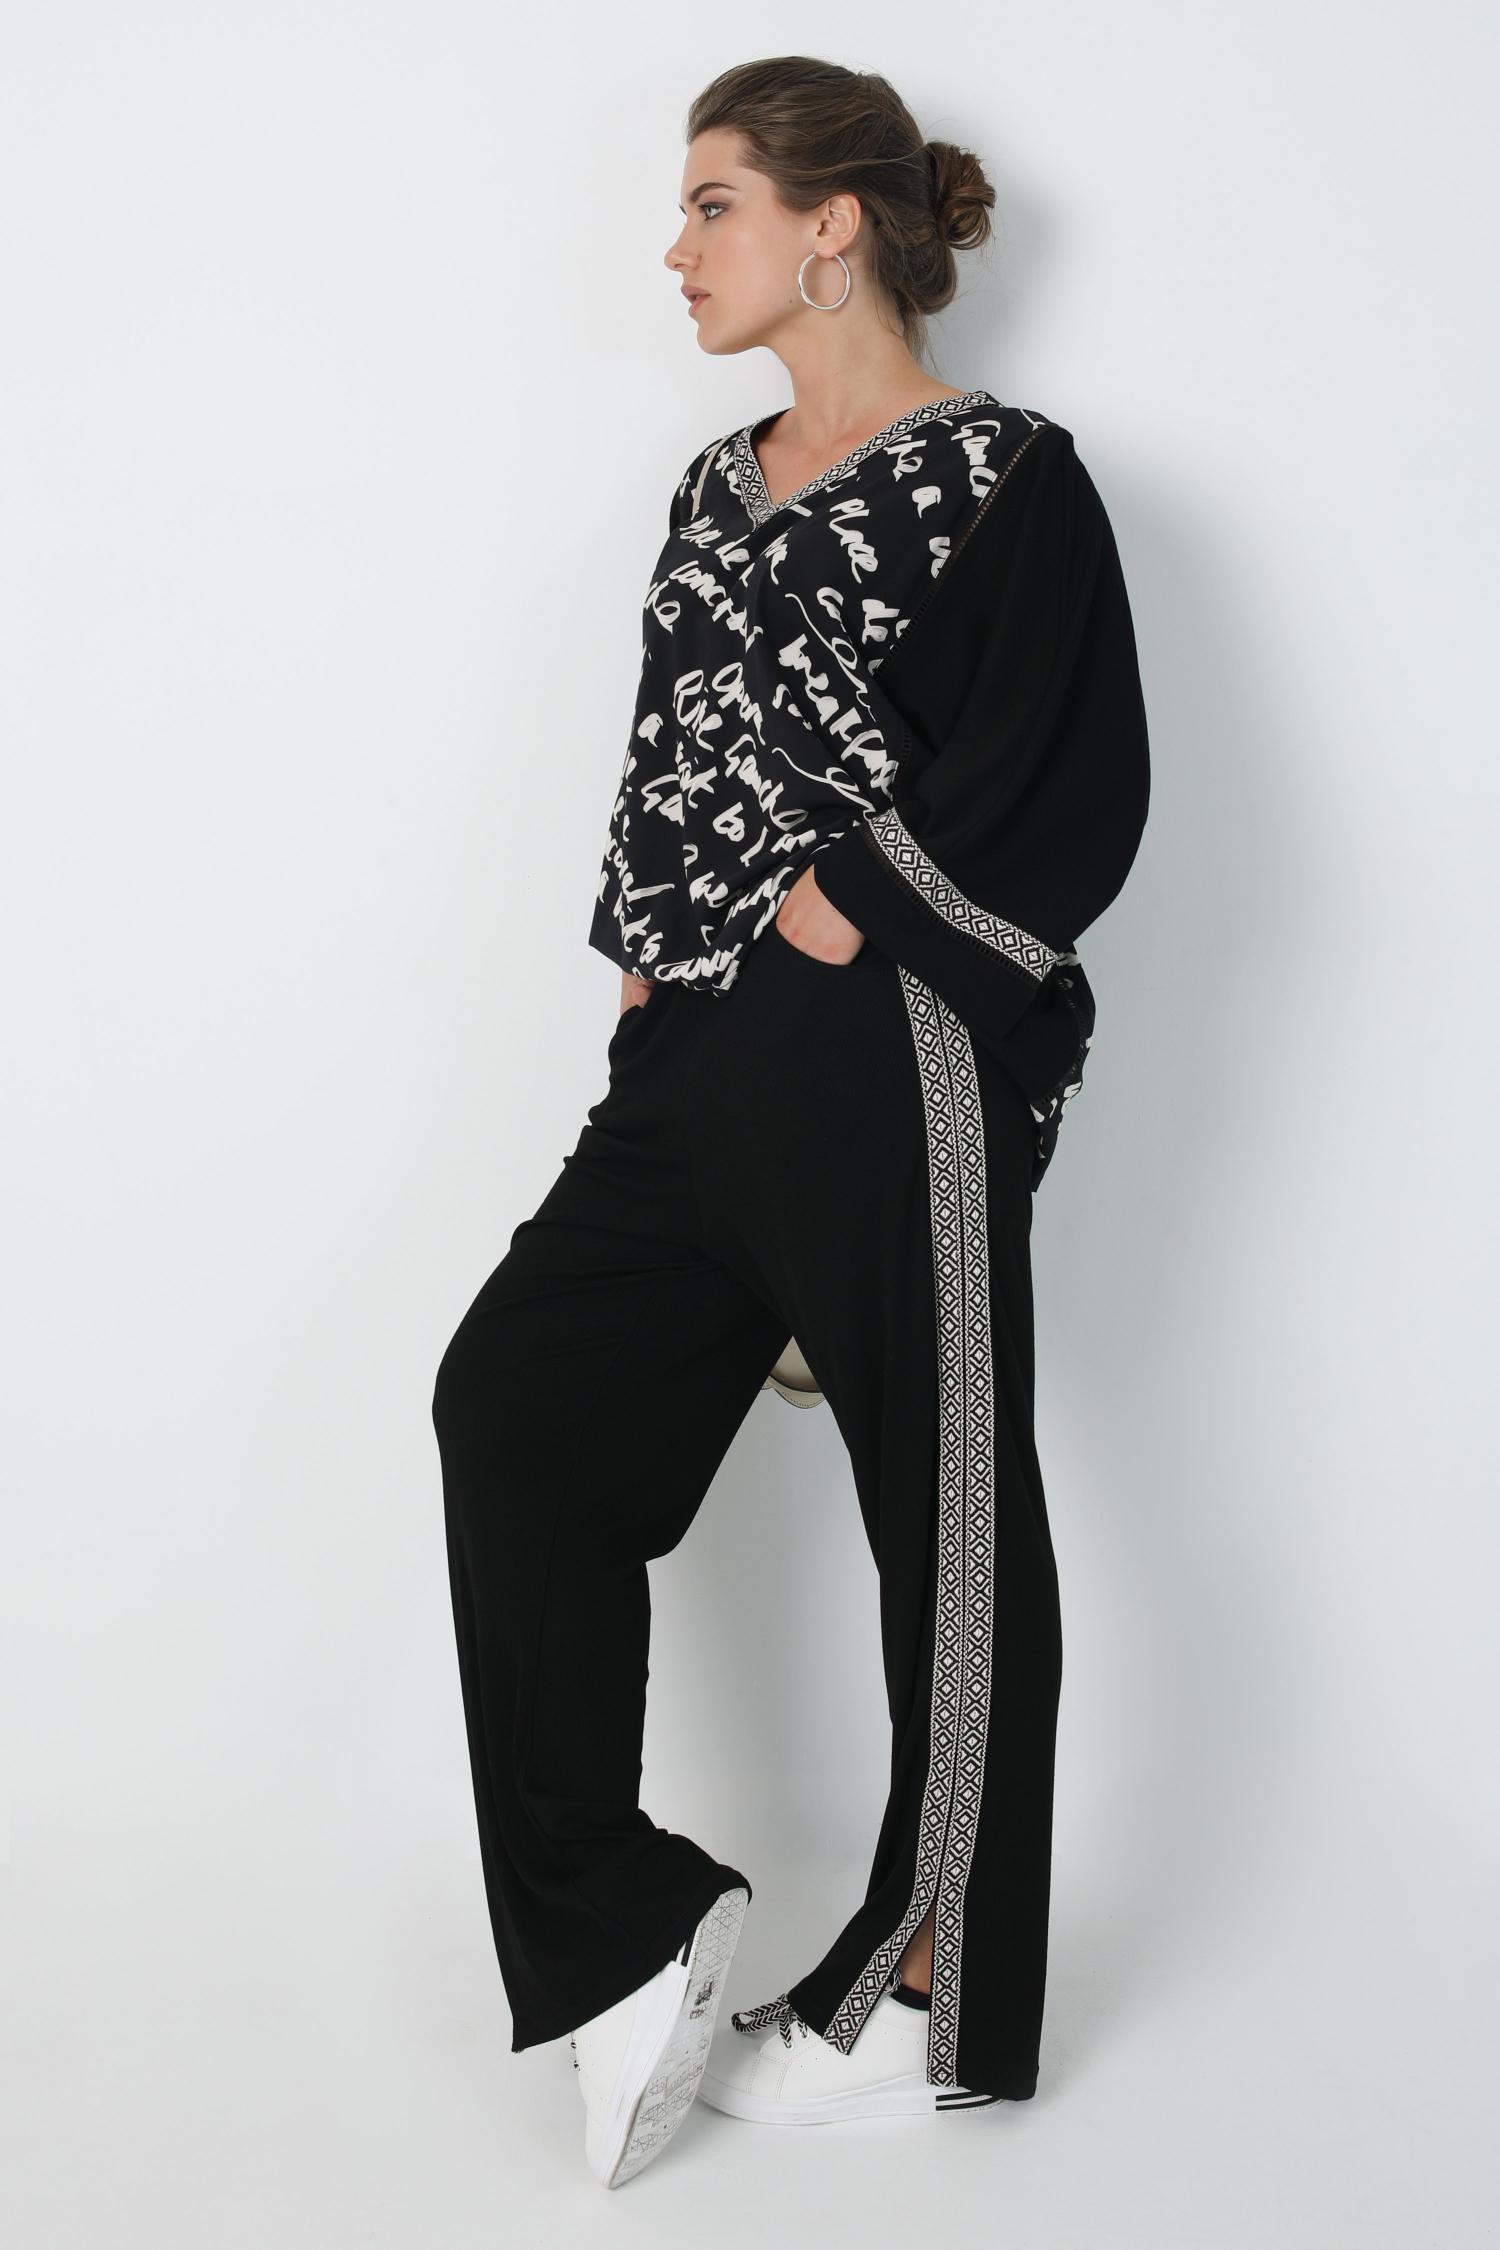 T-shaped tshirt with bi-material mesh and oeko-tex print